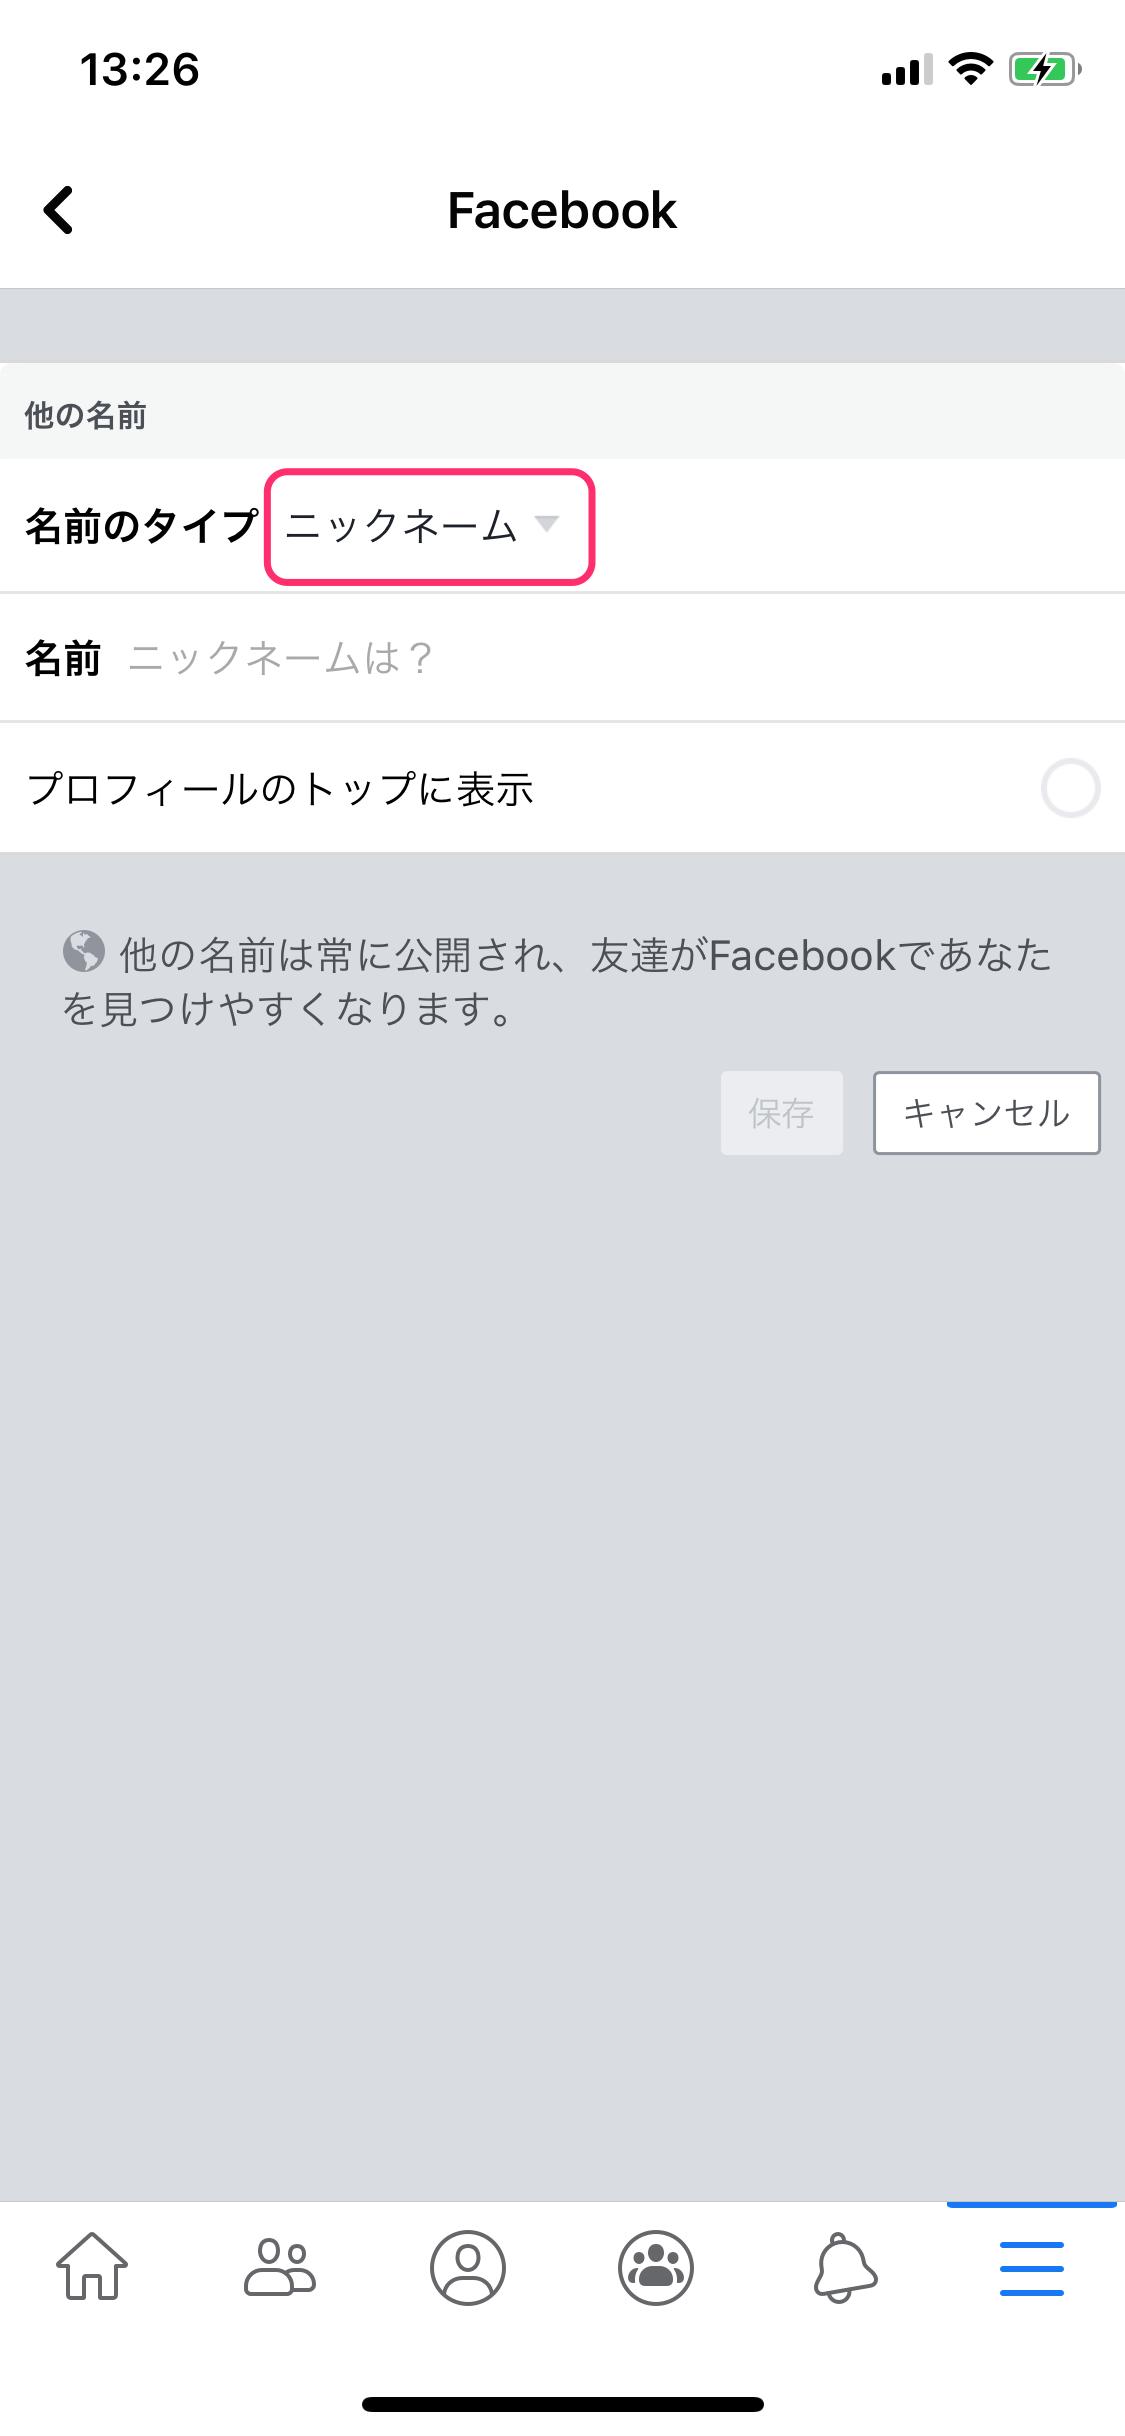 Facebook 他の名前 種類